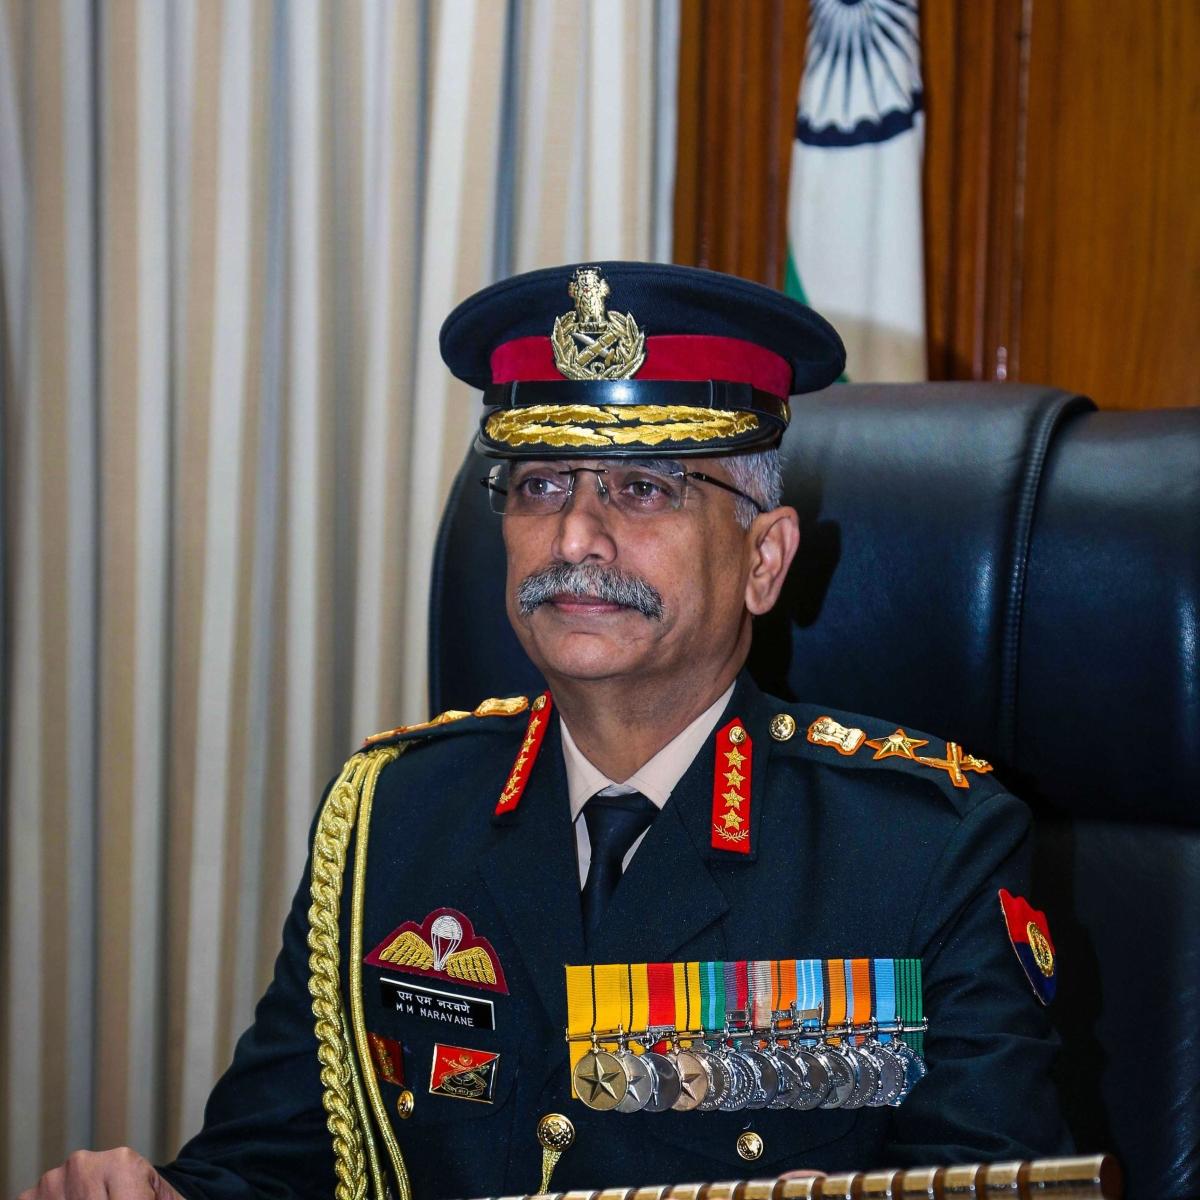 LAC tense, be ready warns Army Chief Manoj Mukund Naravane